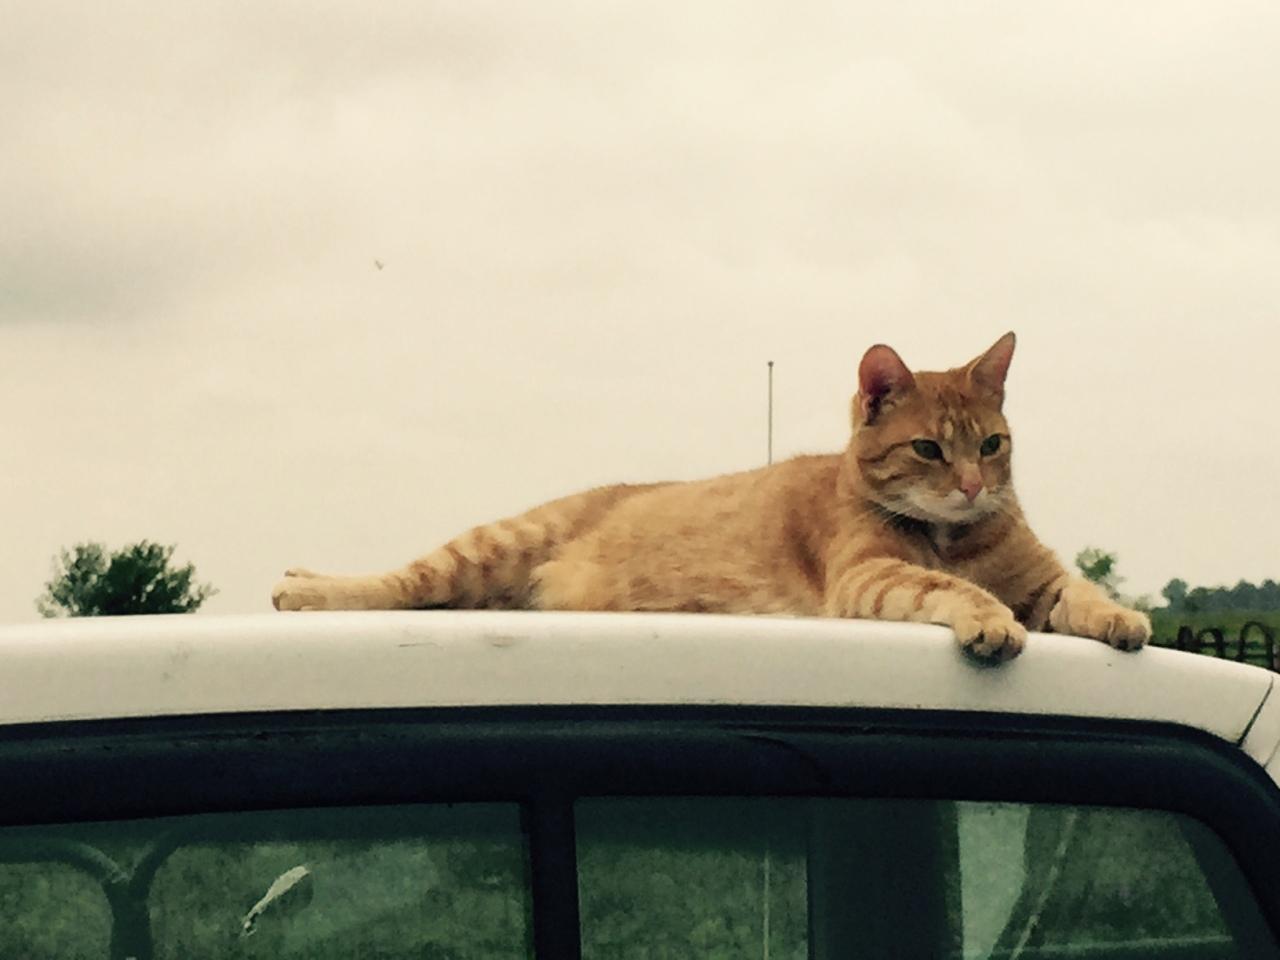 cat on truck